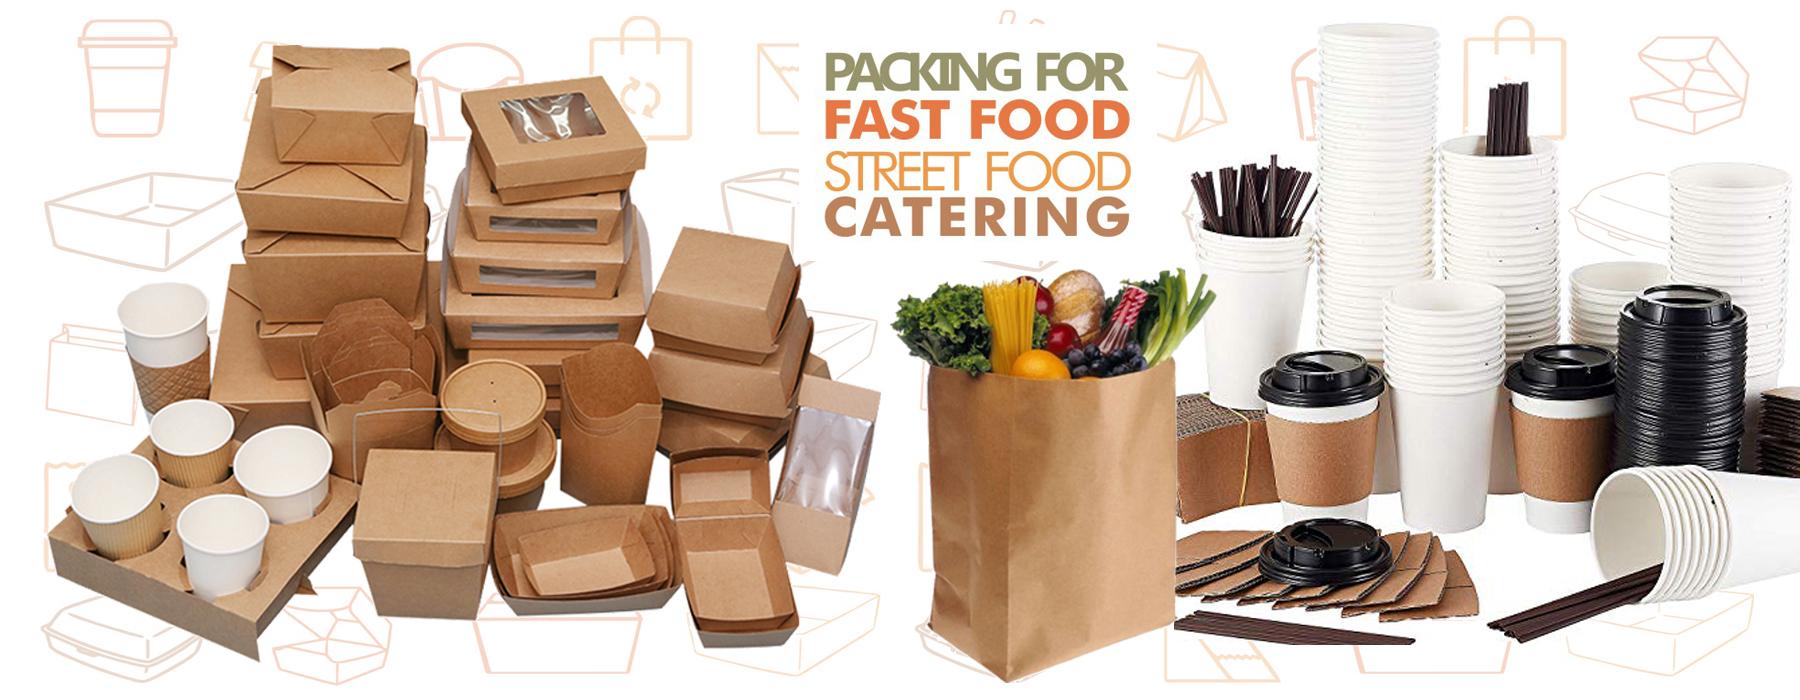 Kraft paper cups, kraft paper boats, kraft cardboard bowls, cardboard burger boxes